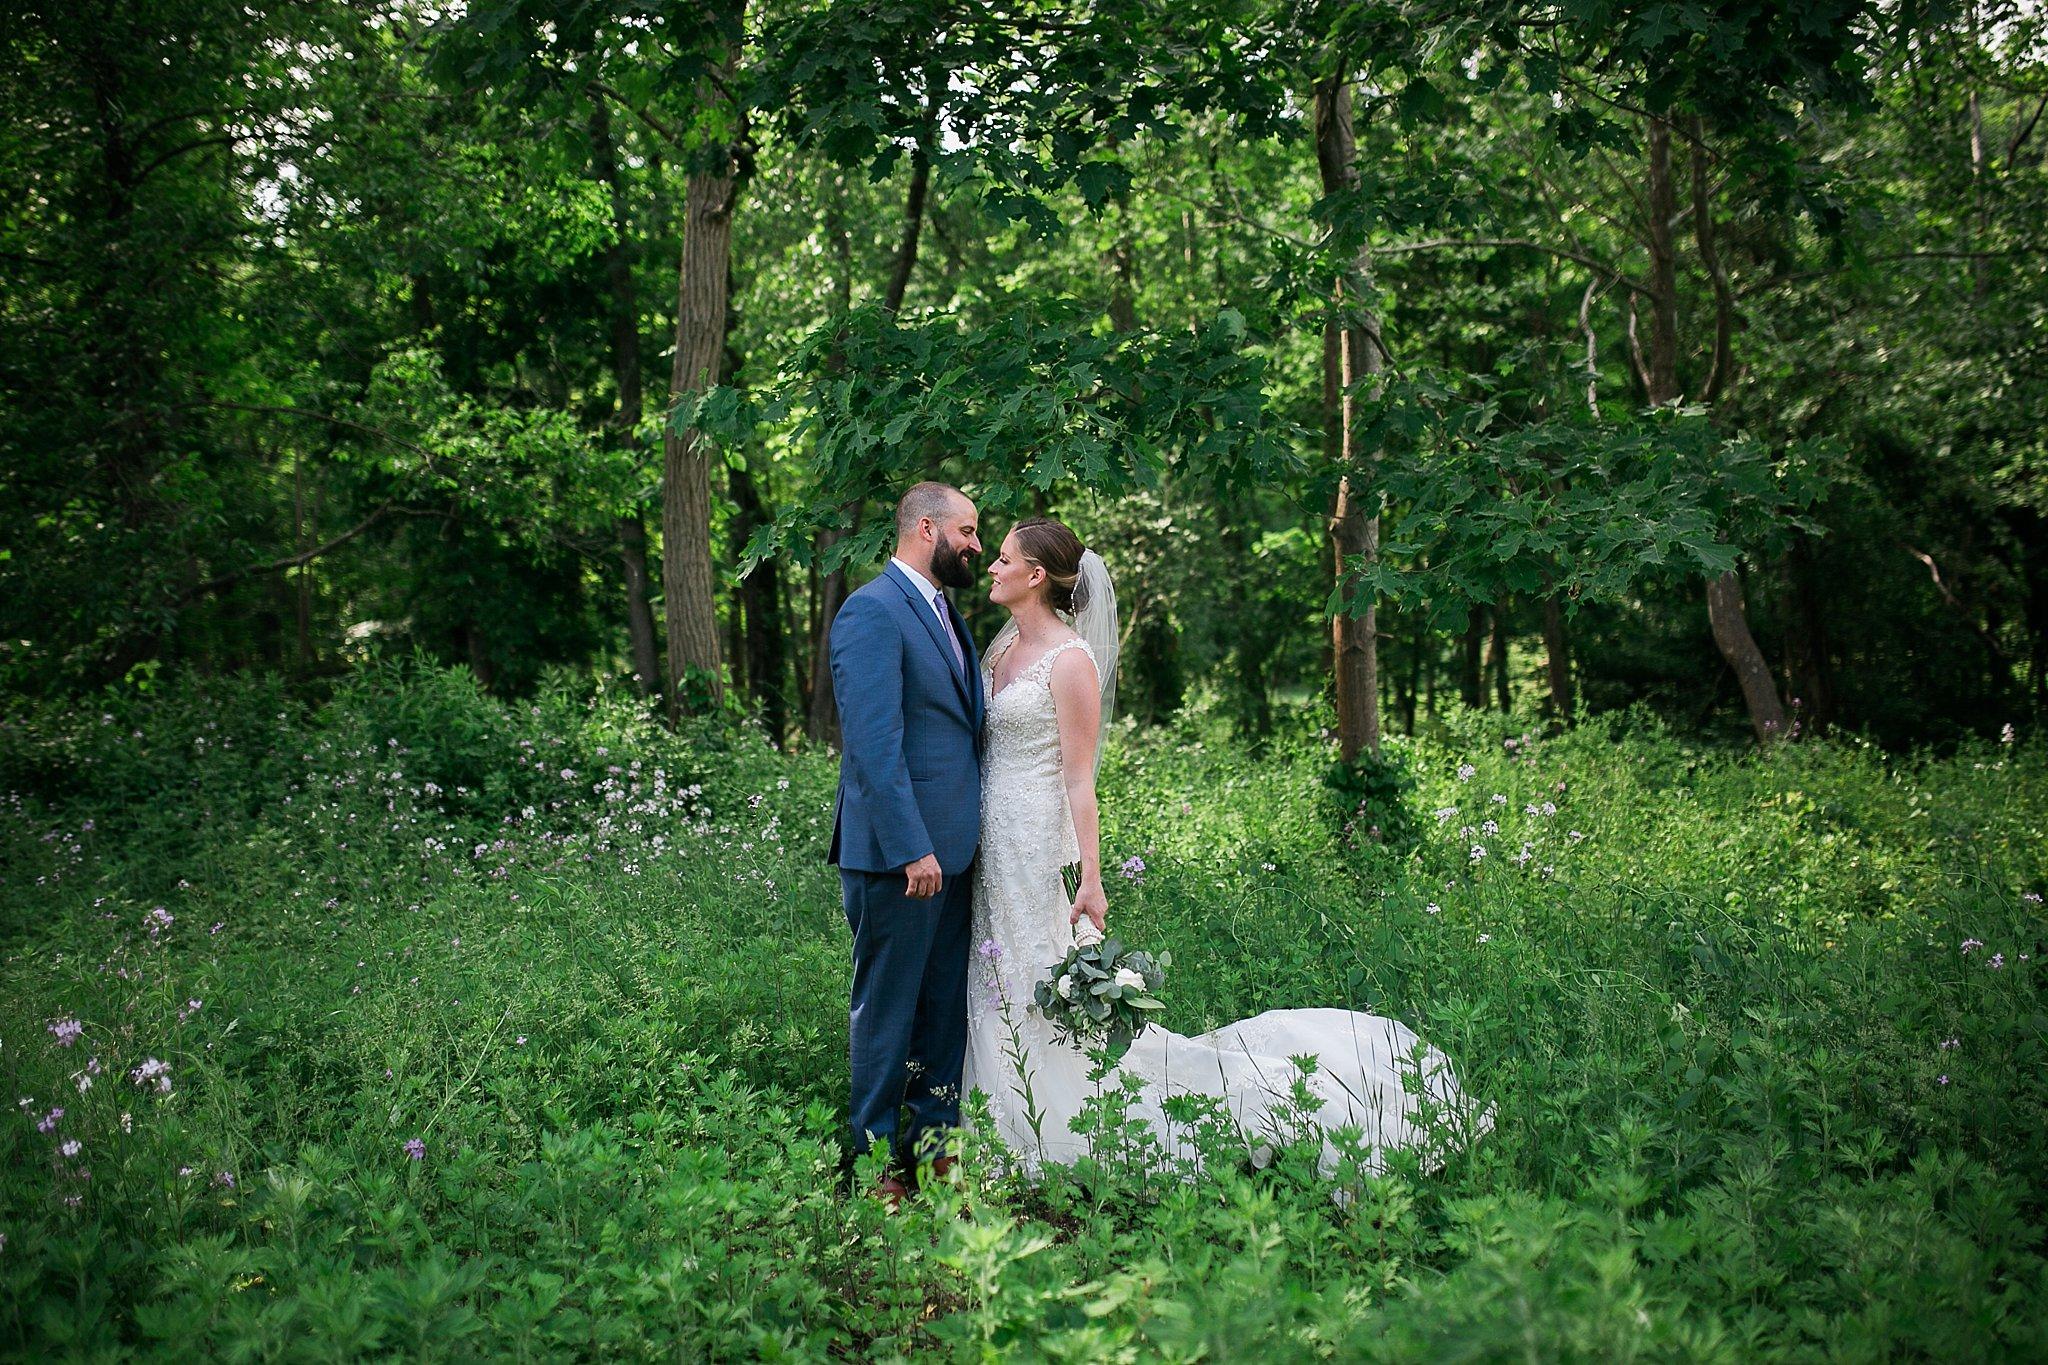 Hollow Brook Golf Club Cortlandt Manor NY Wedding Sweet Alice Photography June Wedding48.jpg